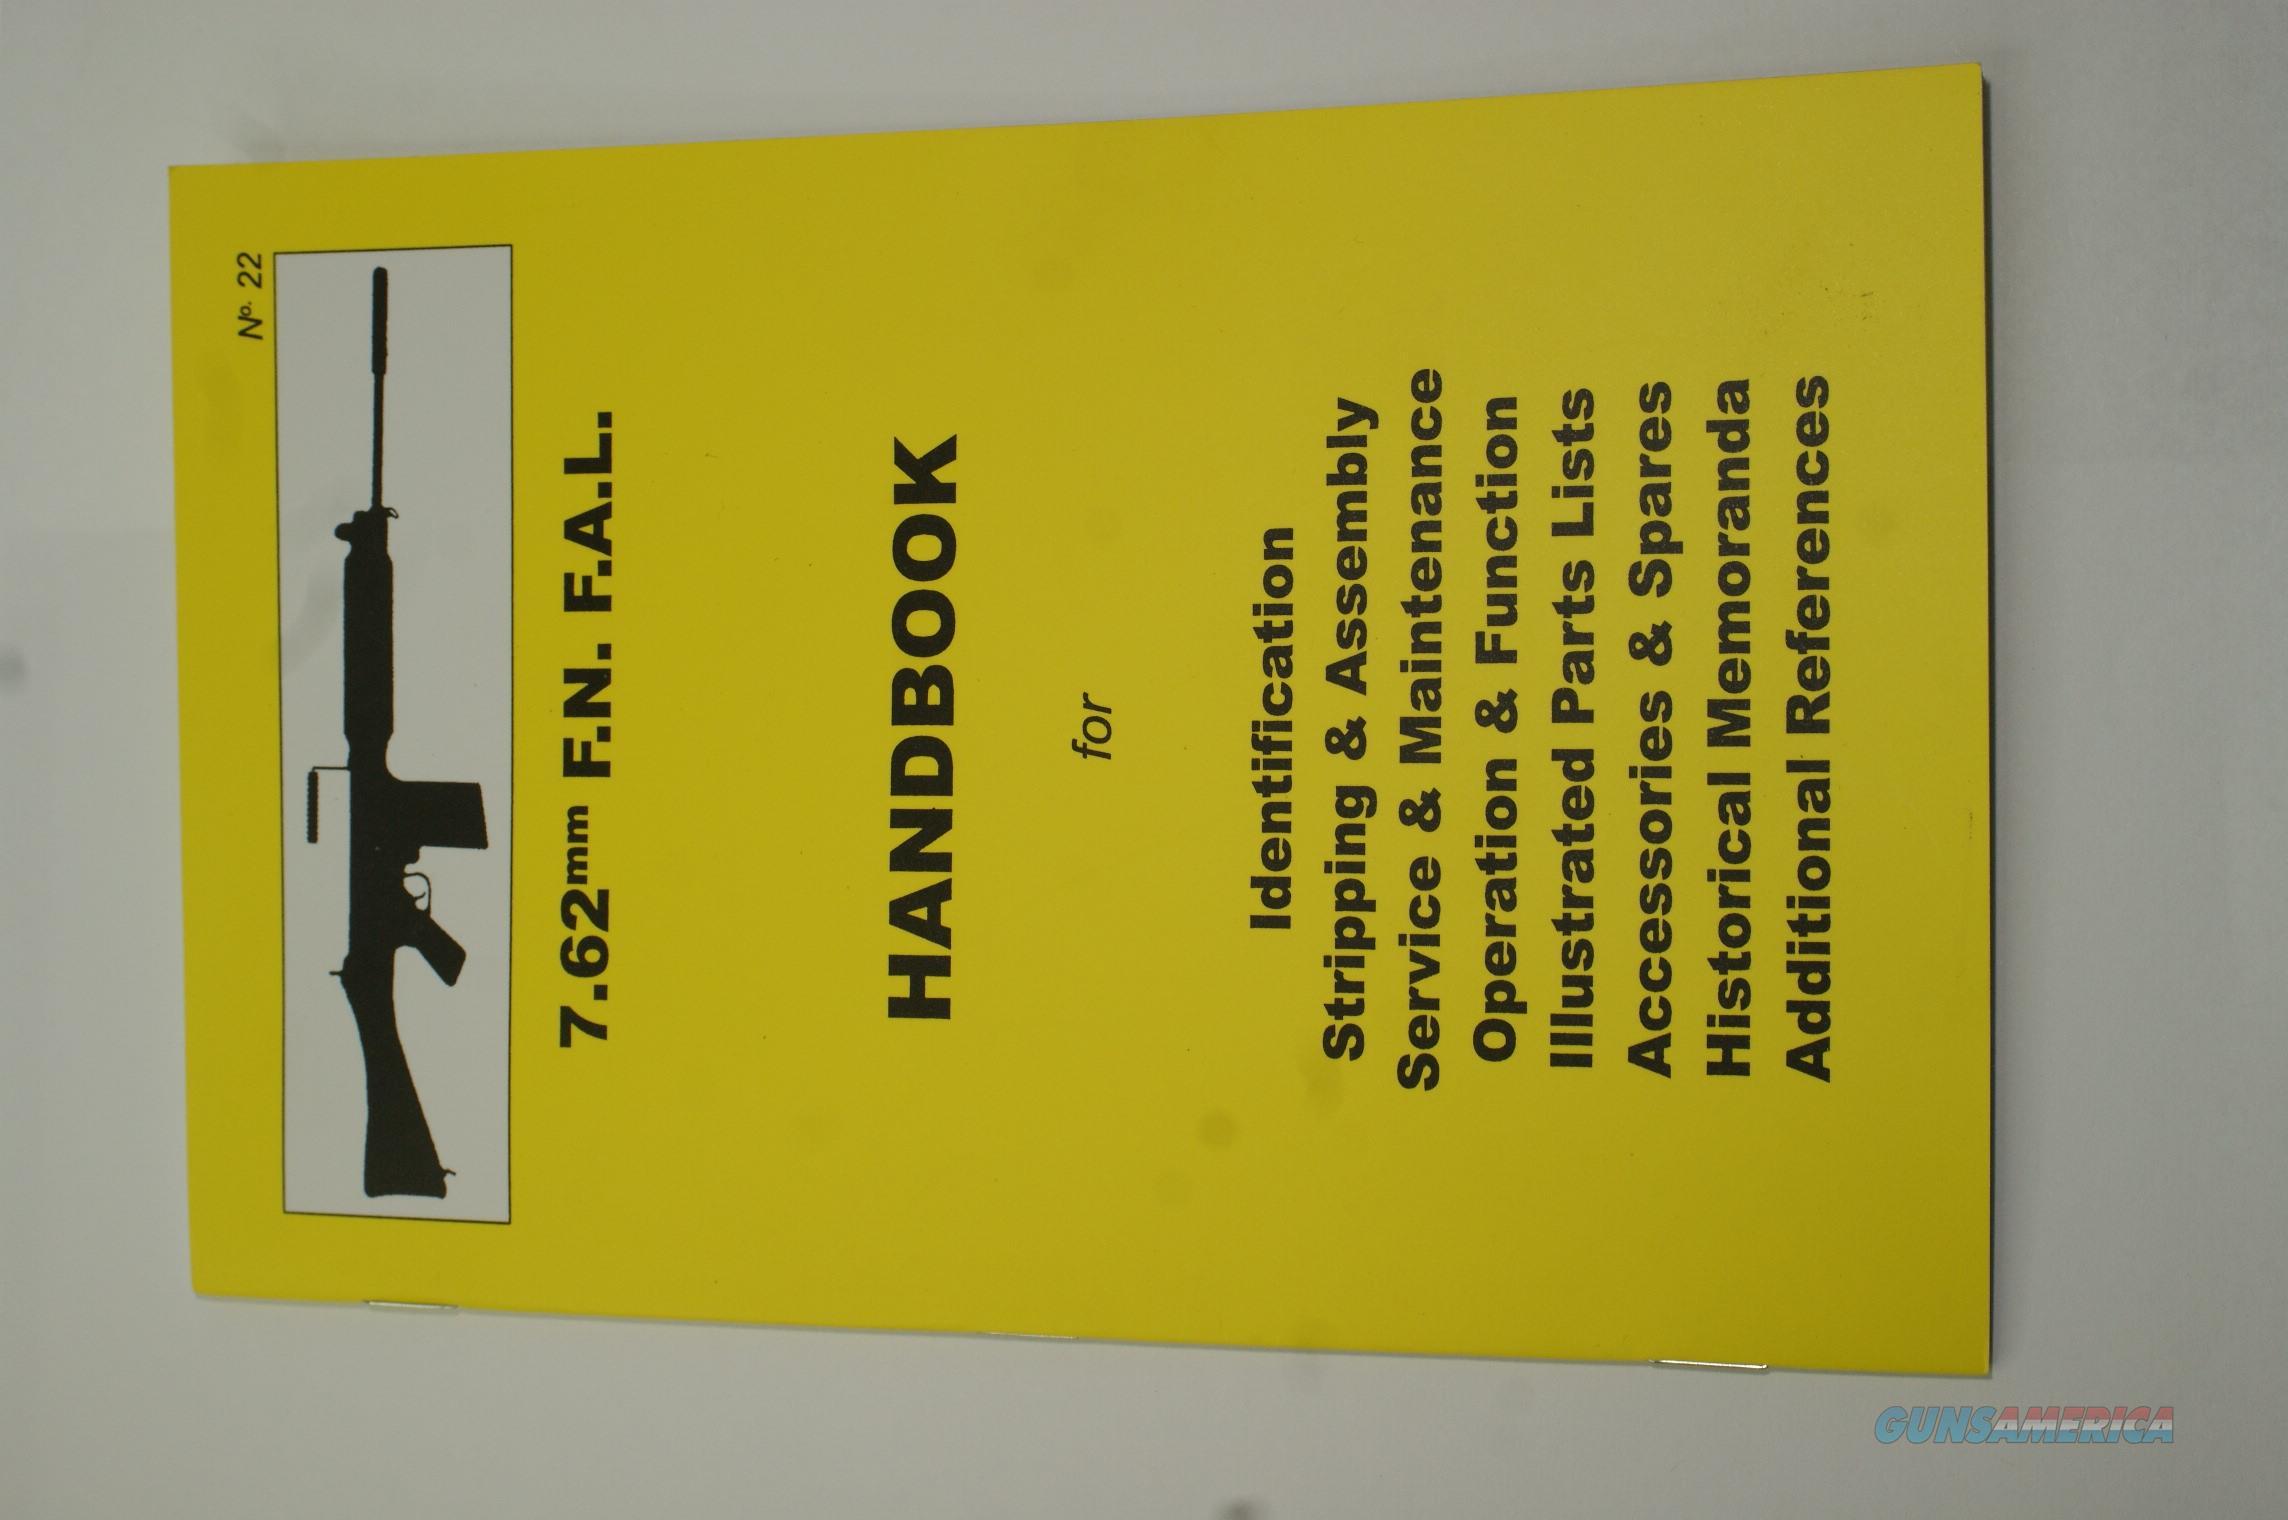 .303 SMLE Rifle No. 1, 7.72mm F.N. F.A.L.Handbooks  Non-Guns > Books & Magazines